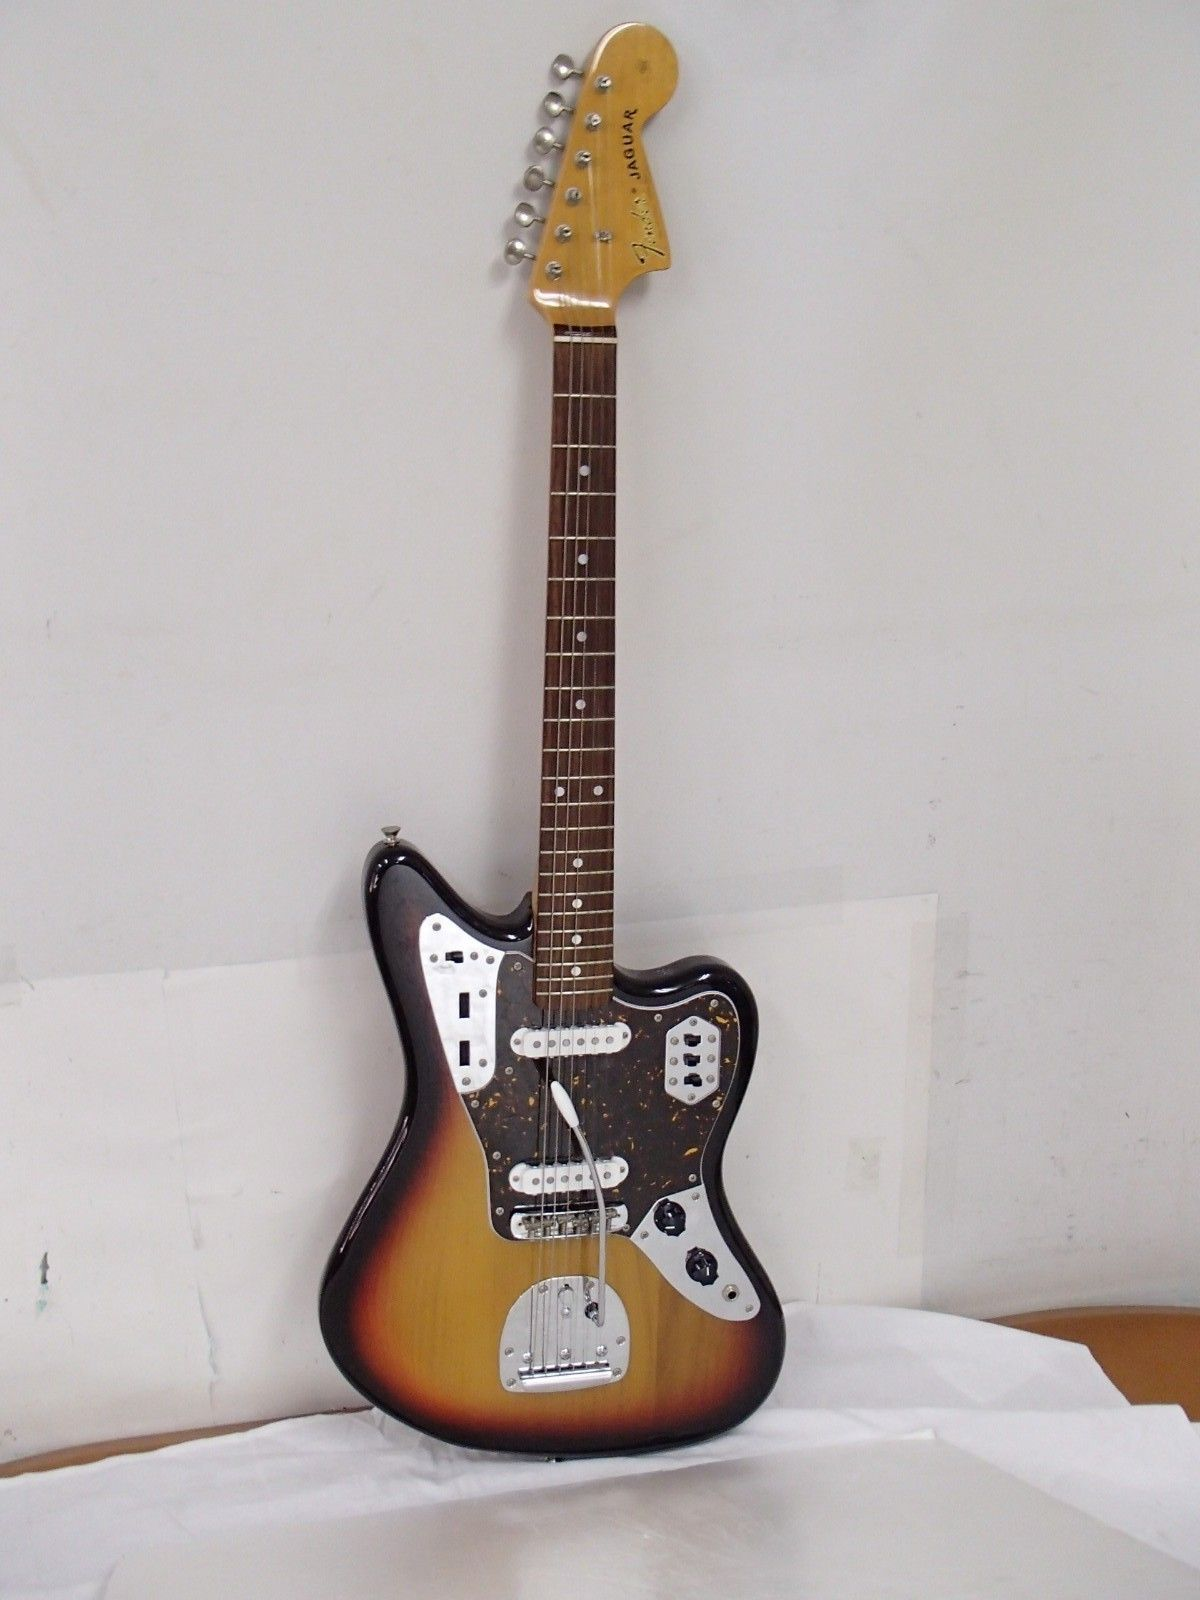 Fender Japan Jaguar Jg66 65 Reissue Mij Vintage 3t Sunburst T Series 2008 Fender Japan Electric Guitar Guitar